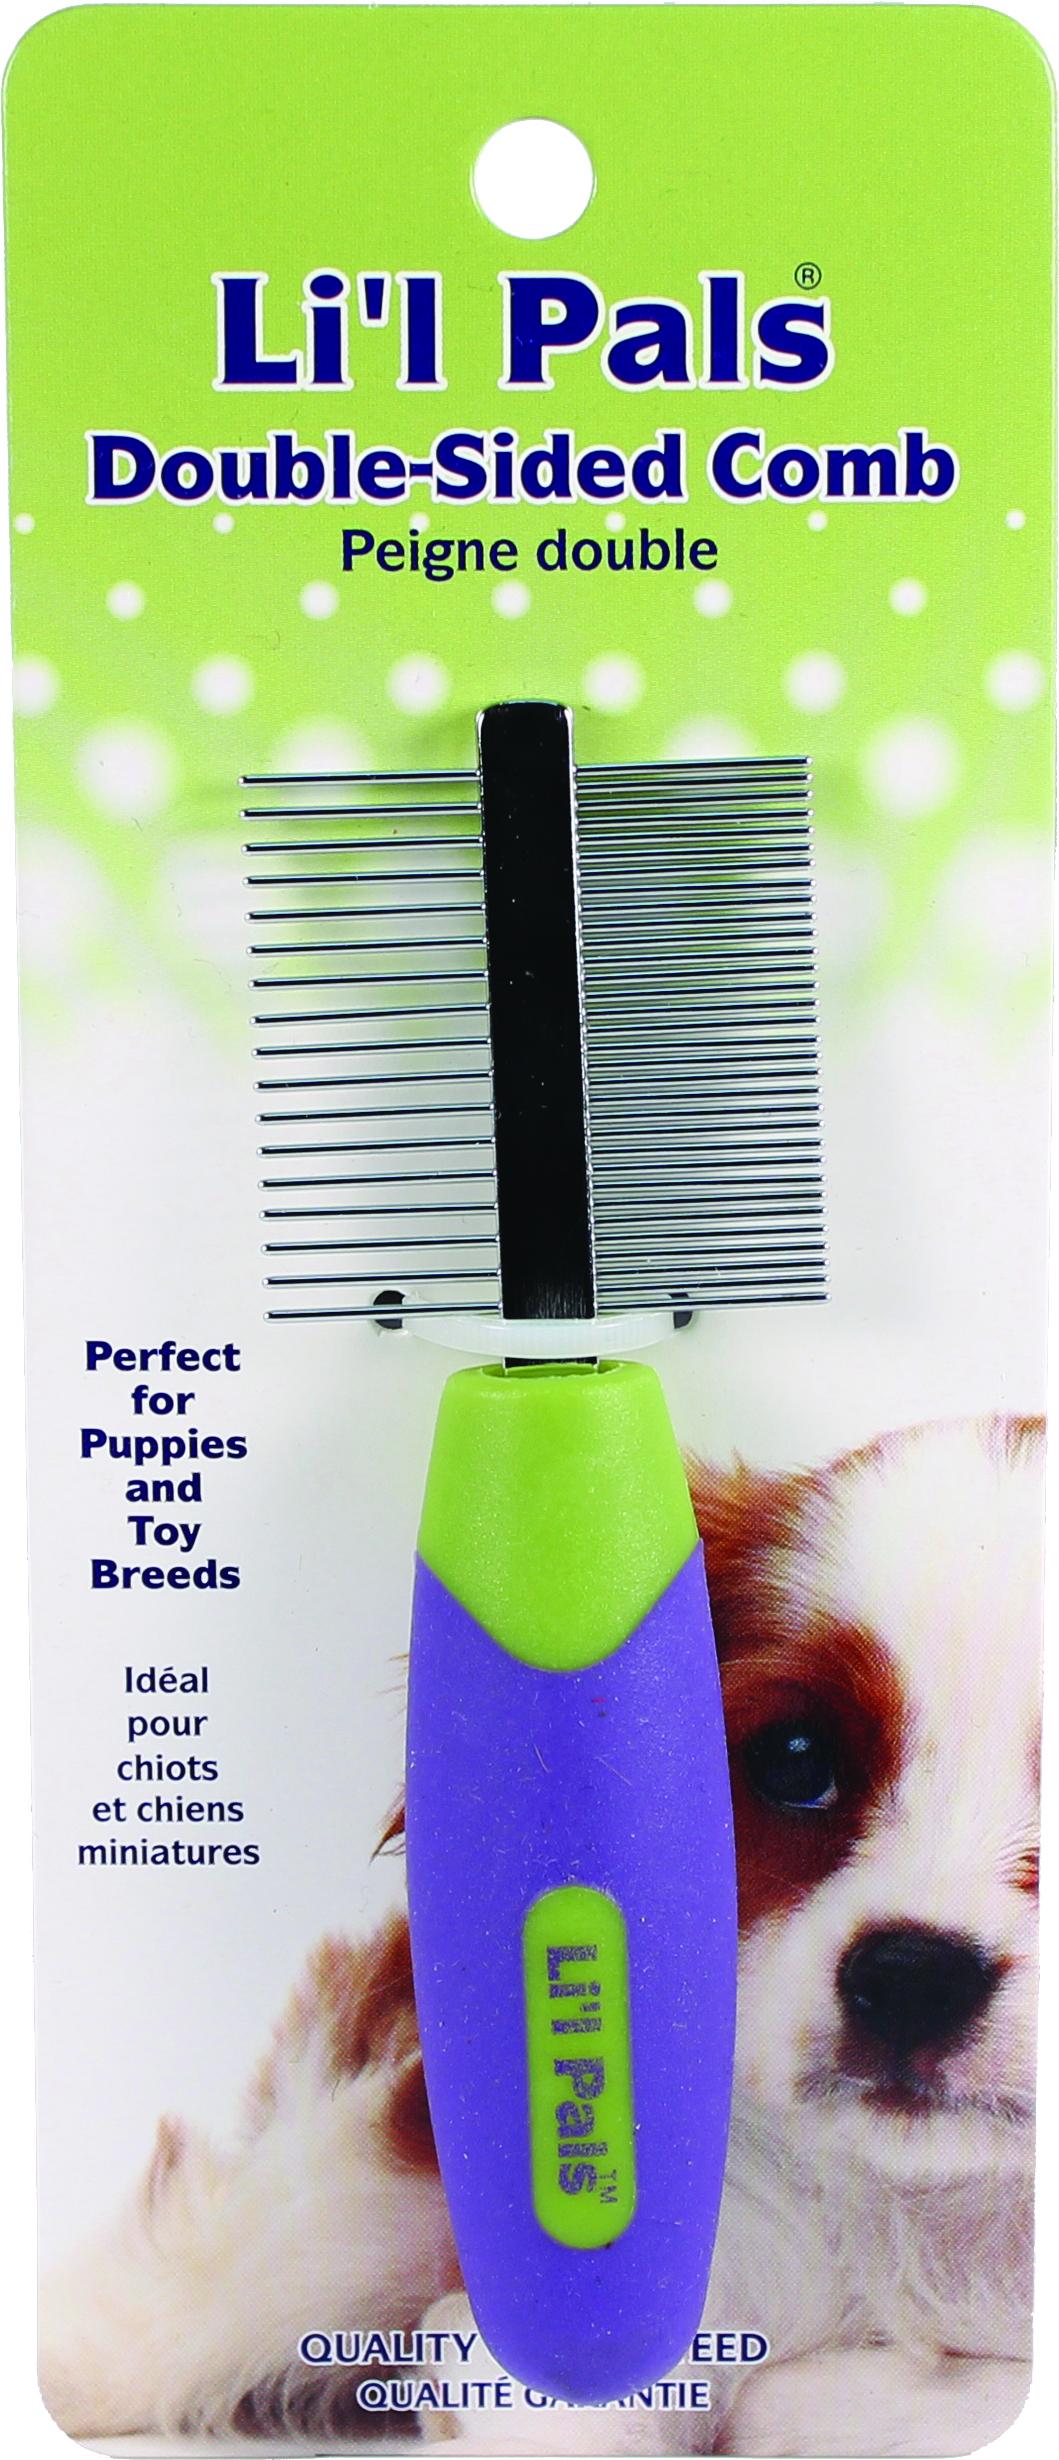 Li'l Pals Double-Sided Comb